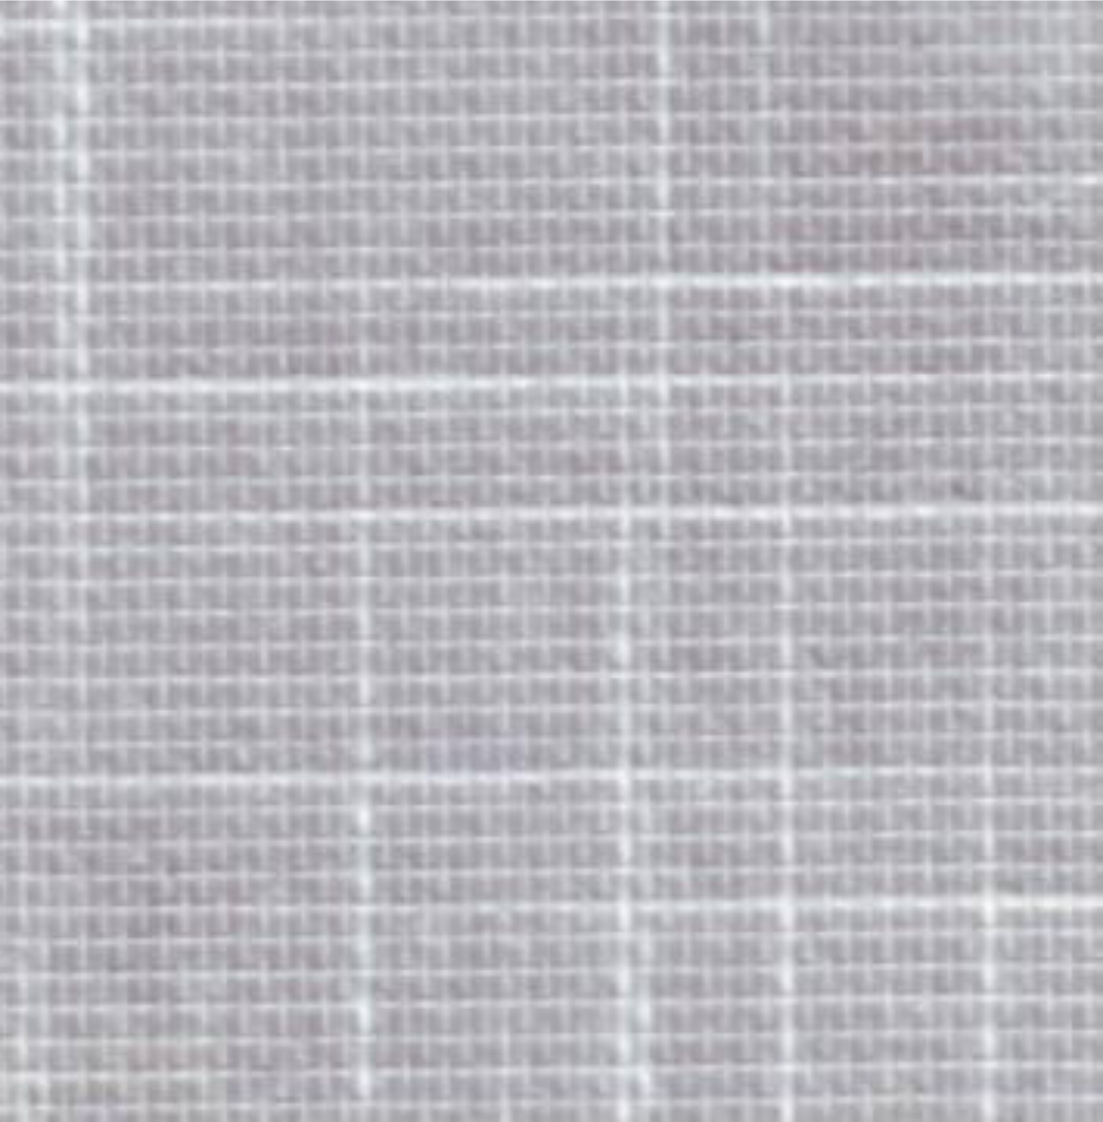 S146++.jpg